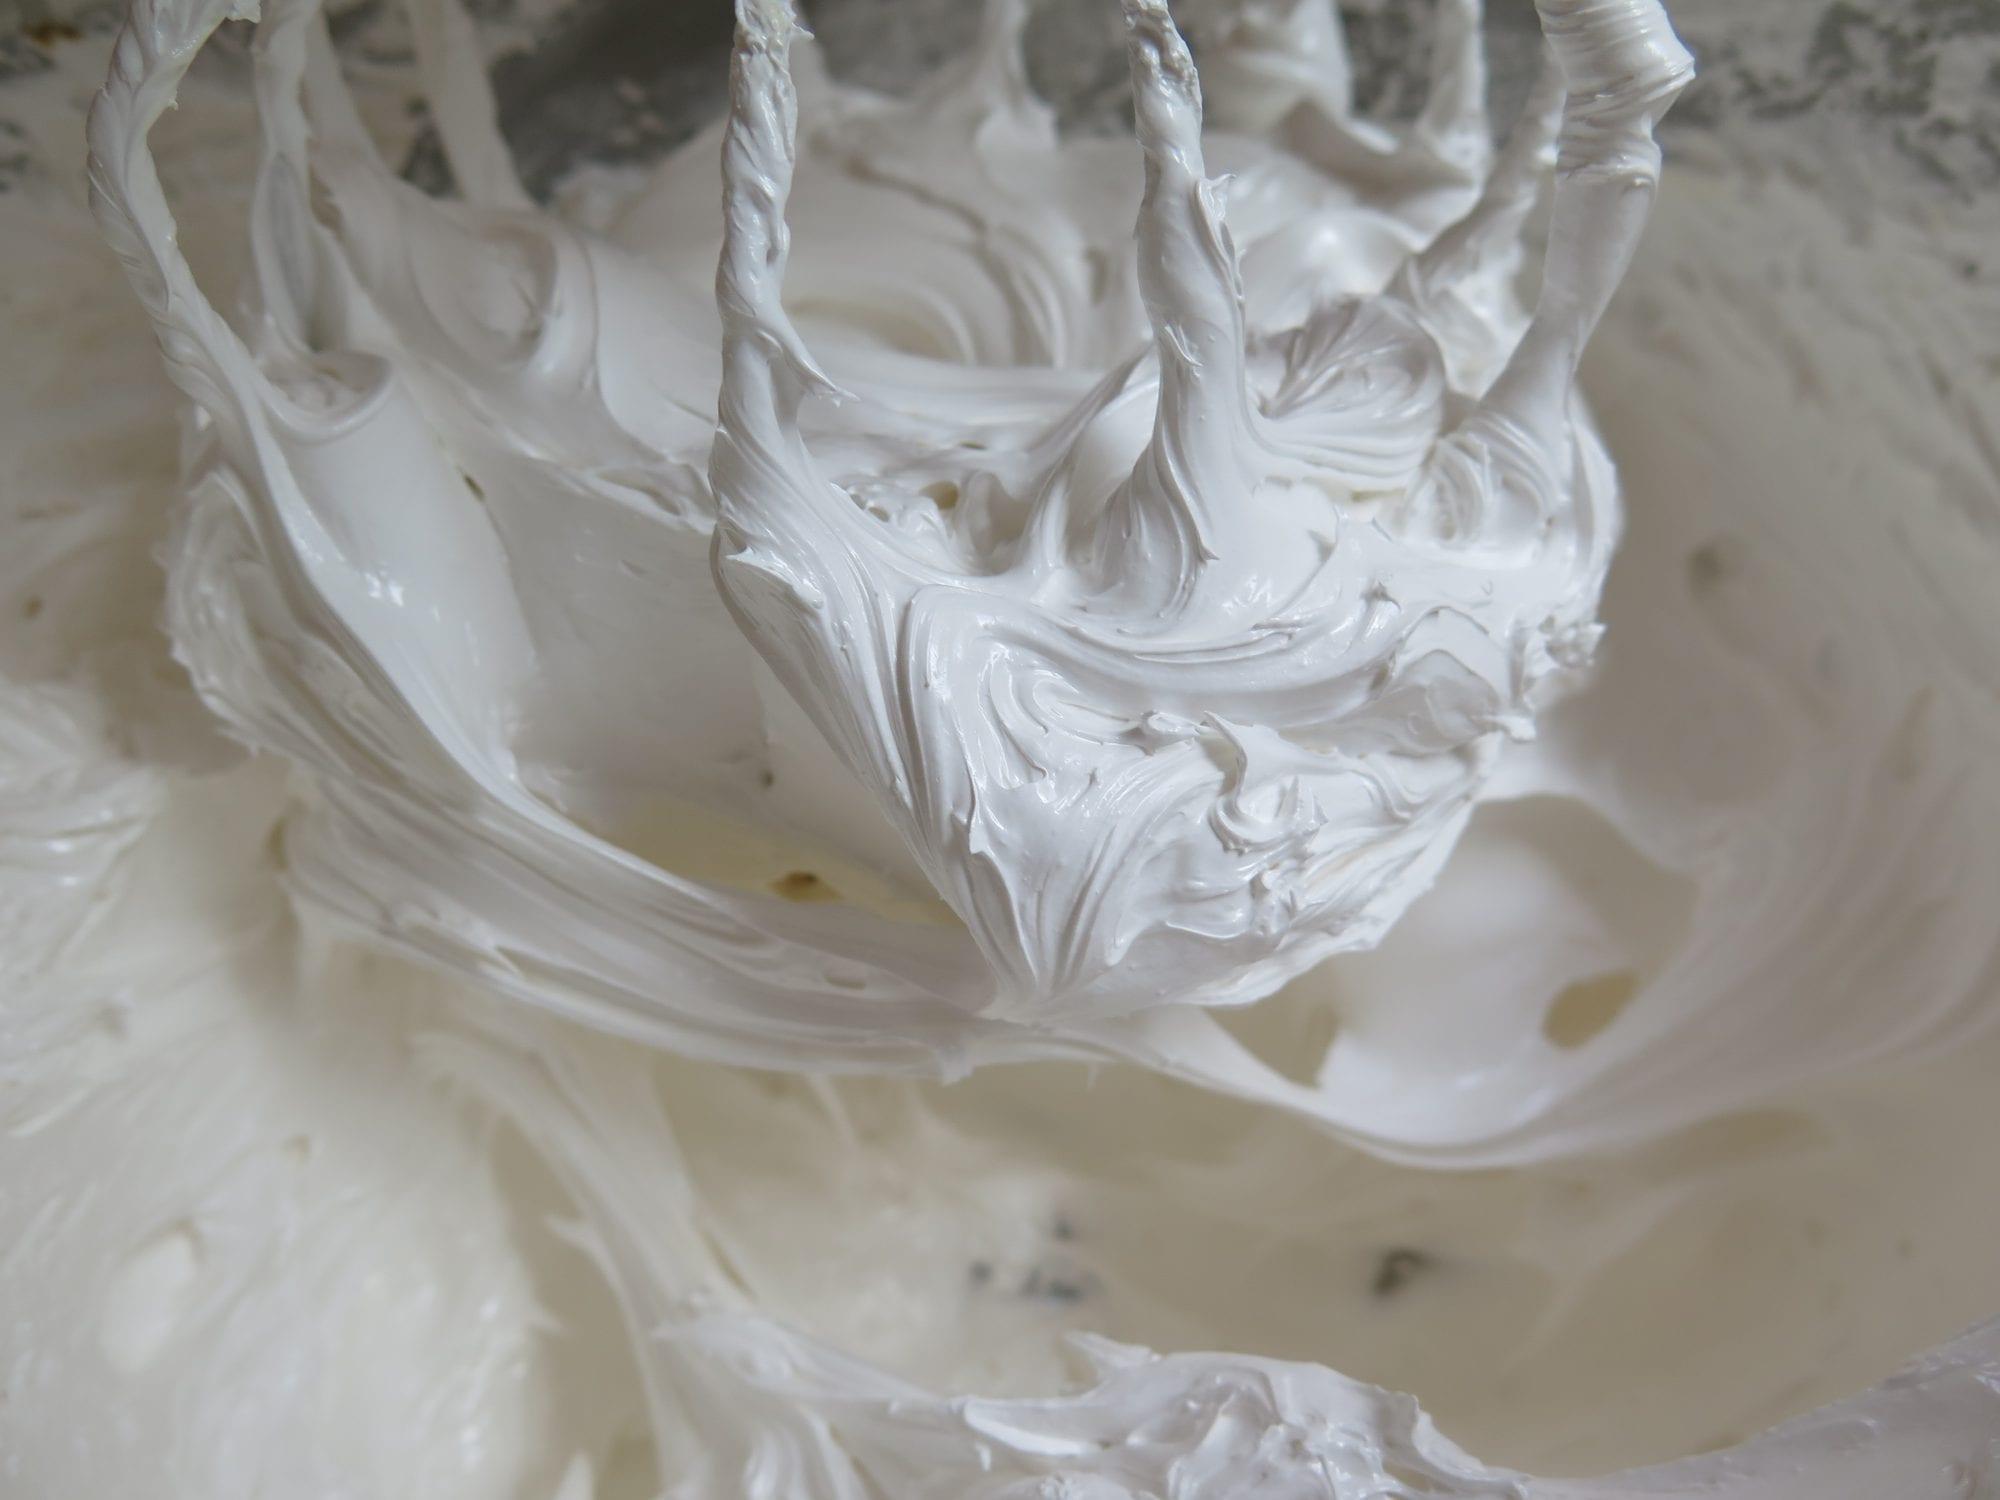 Homemade Marshmallow Fluff   Jessie Sheehan Bakes